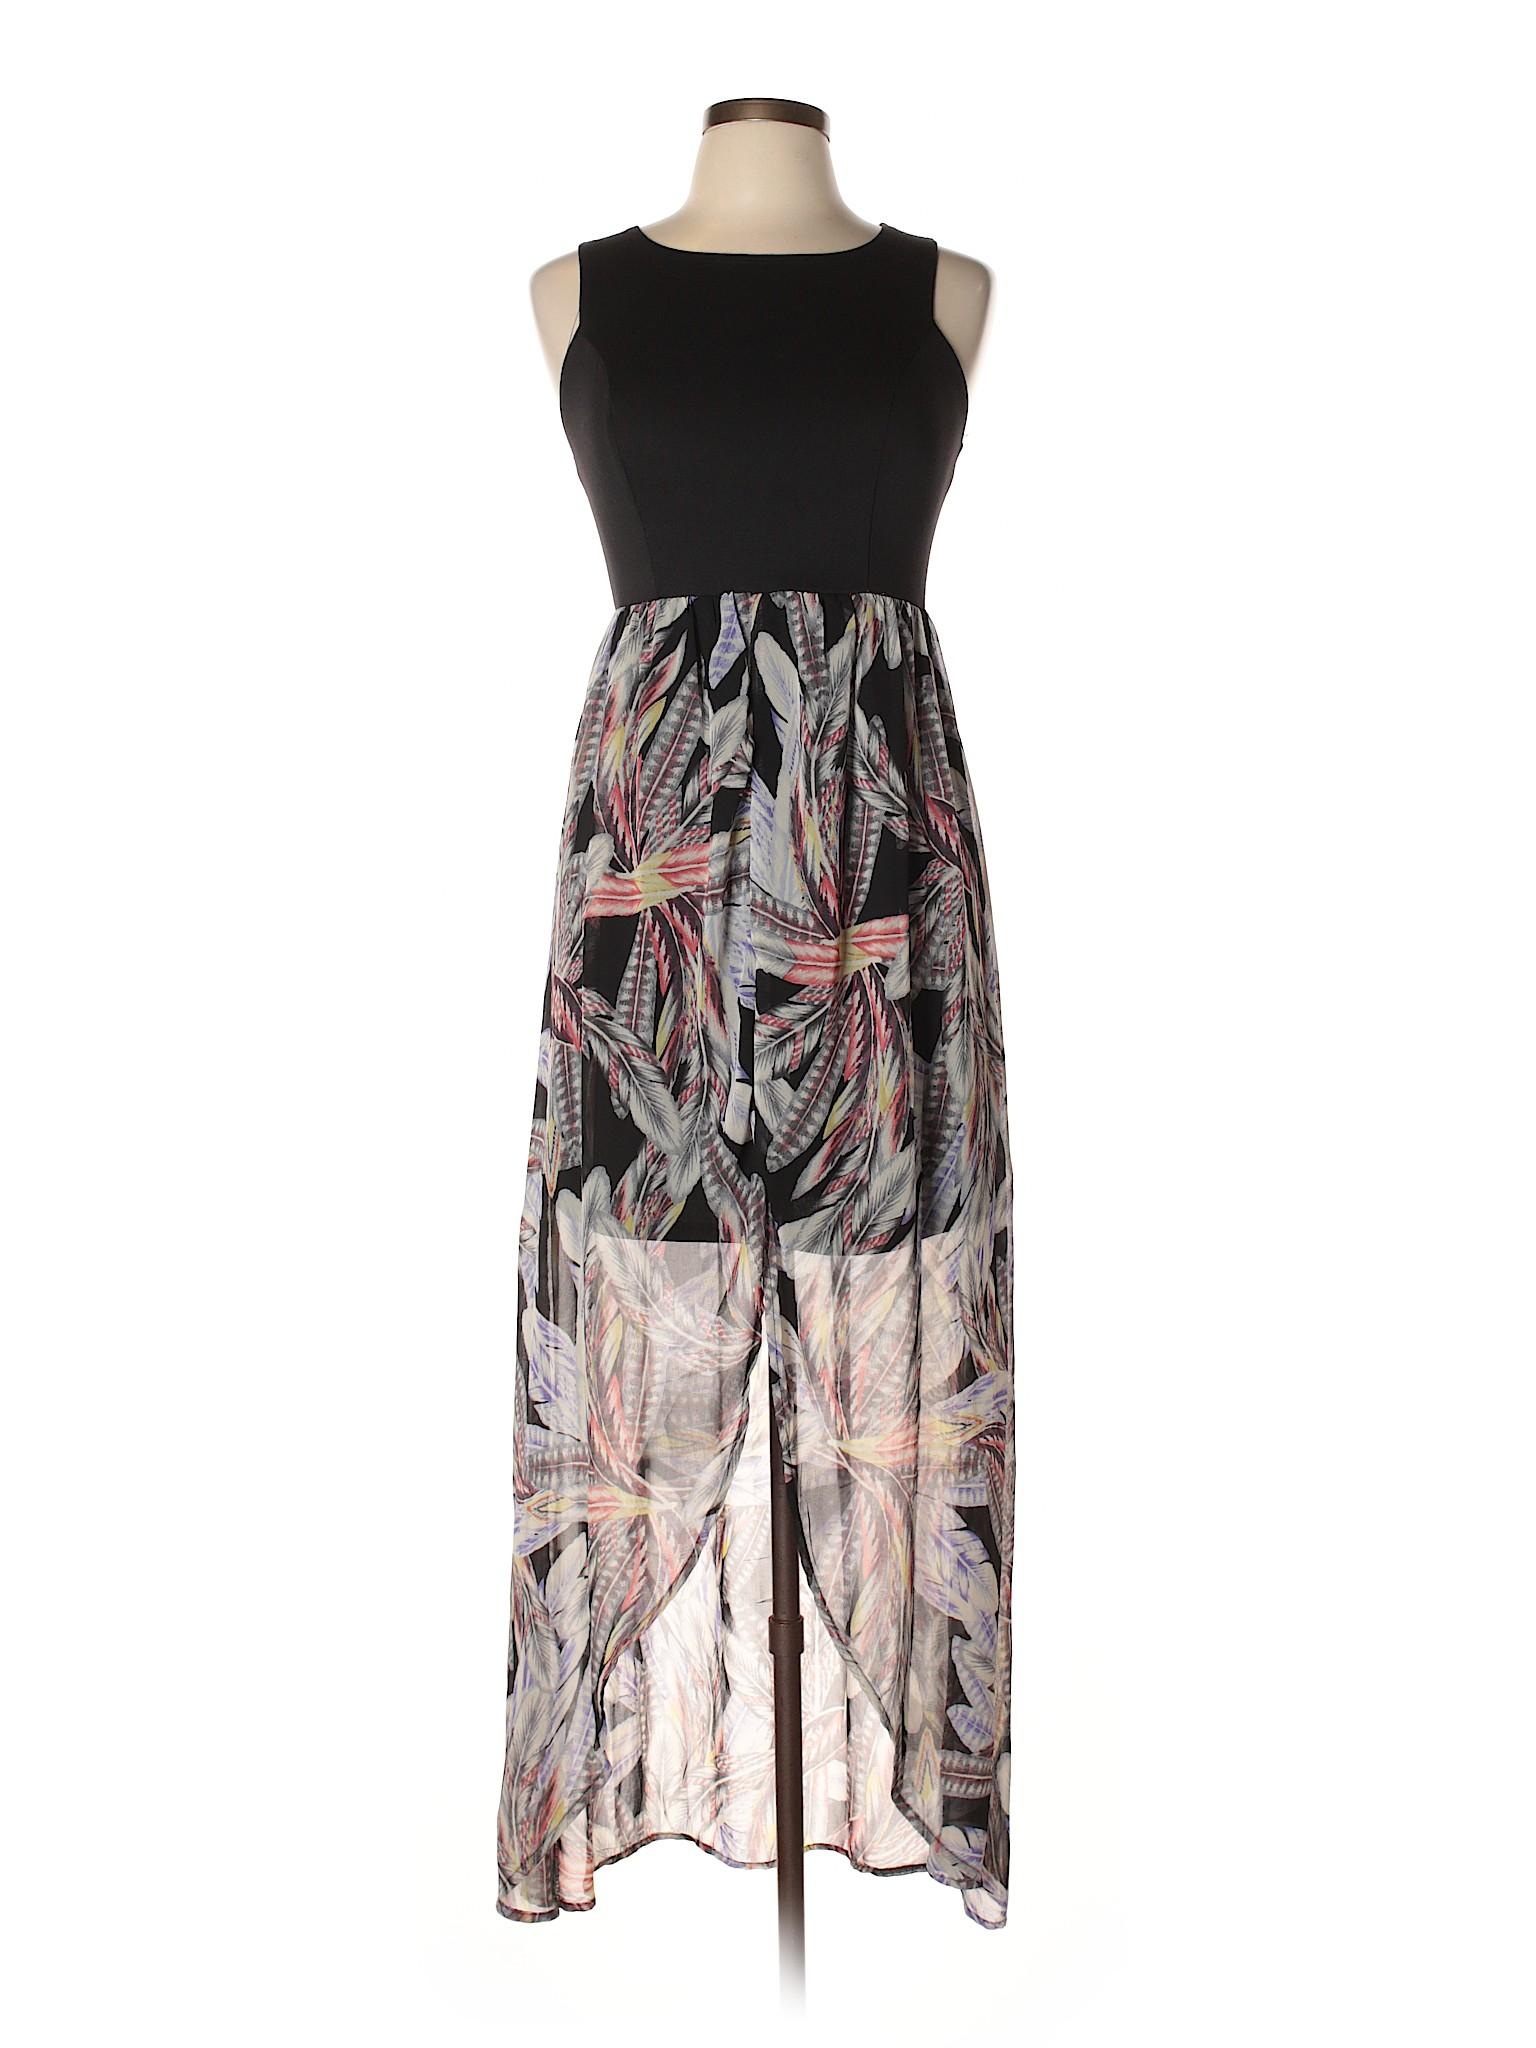 Dress Casual Casual Xhilaration Boutique winter Boutique Xhilaration winter HCx0FqWw